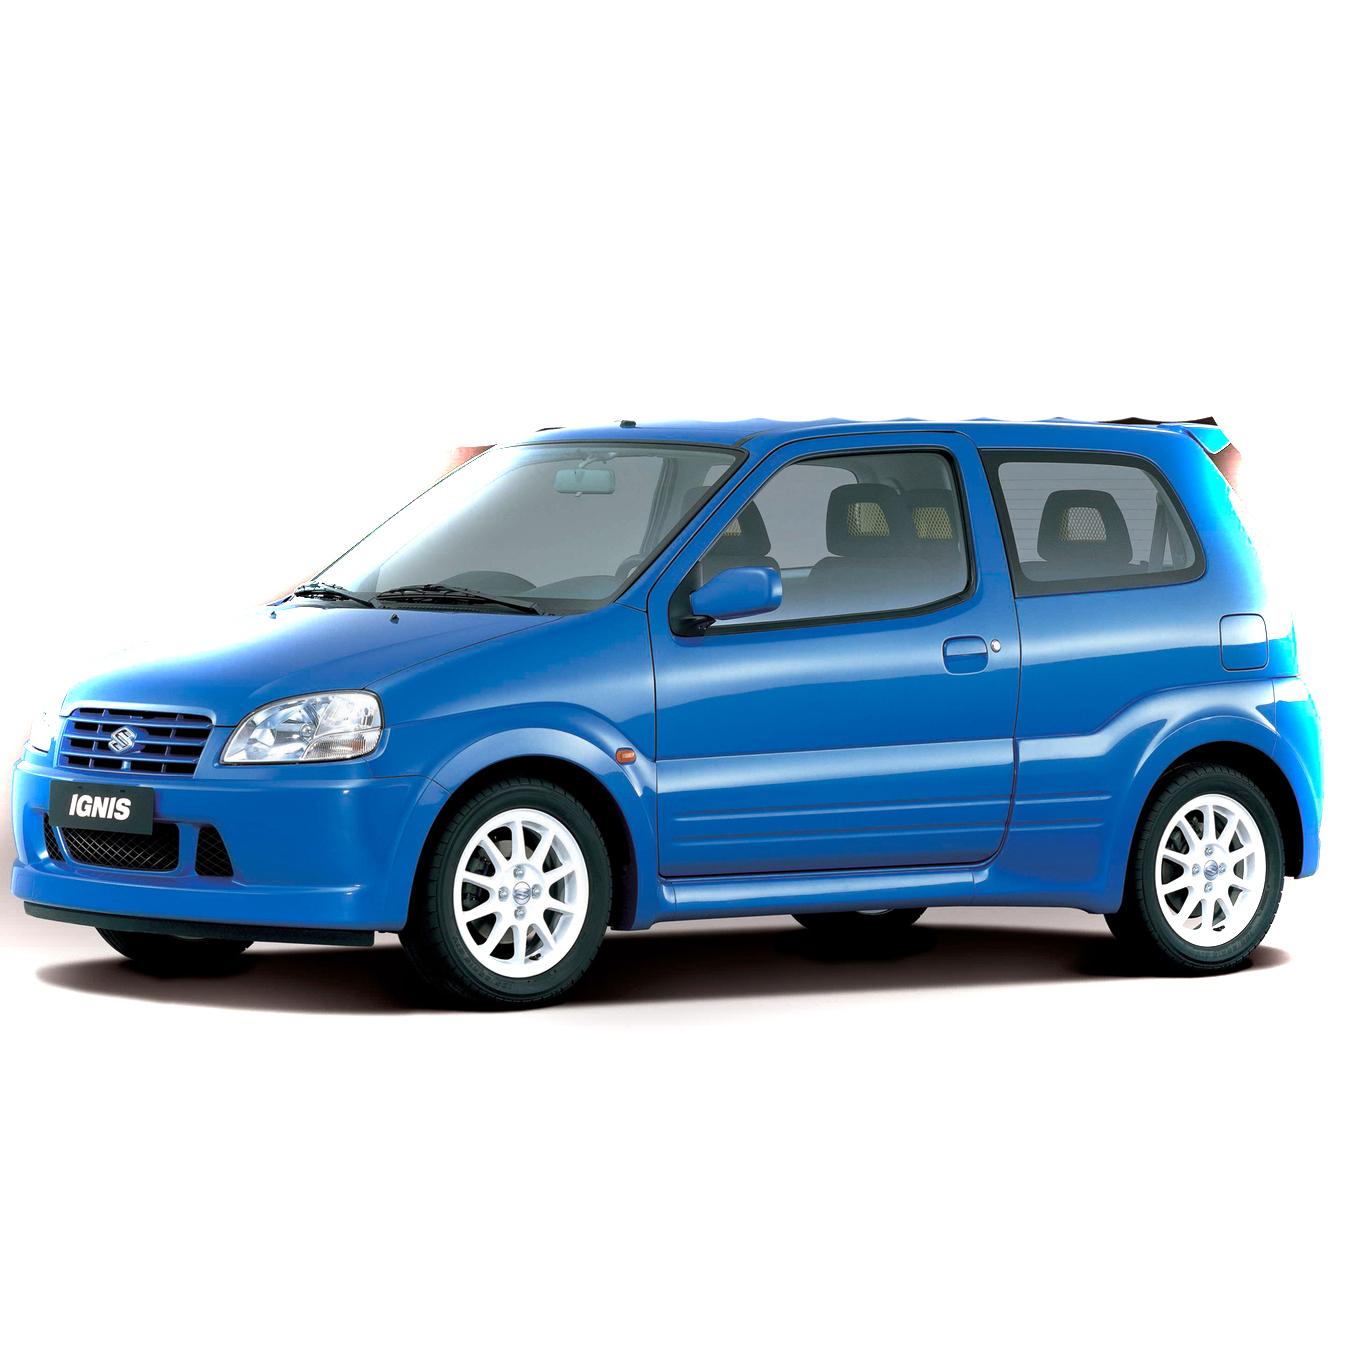 Suzuki Ignis Car Mats